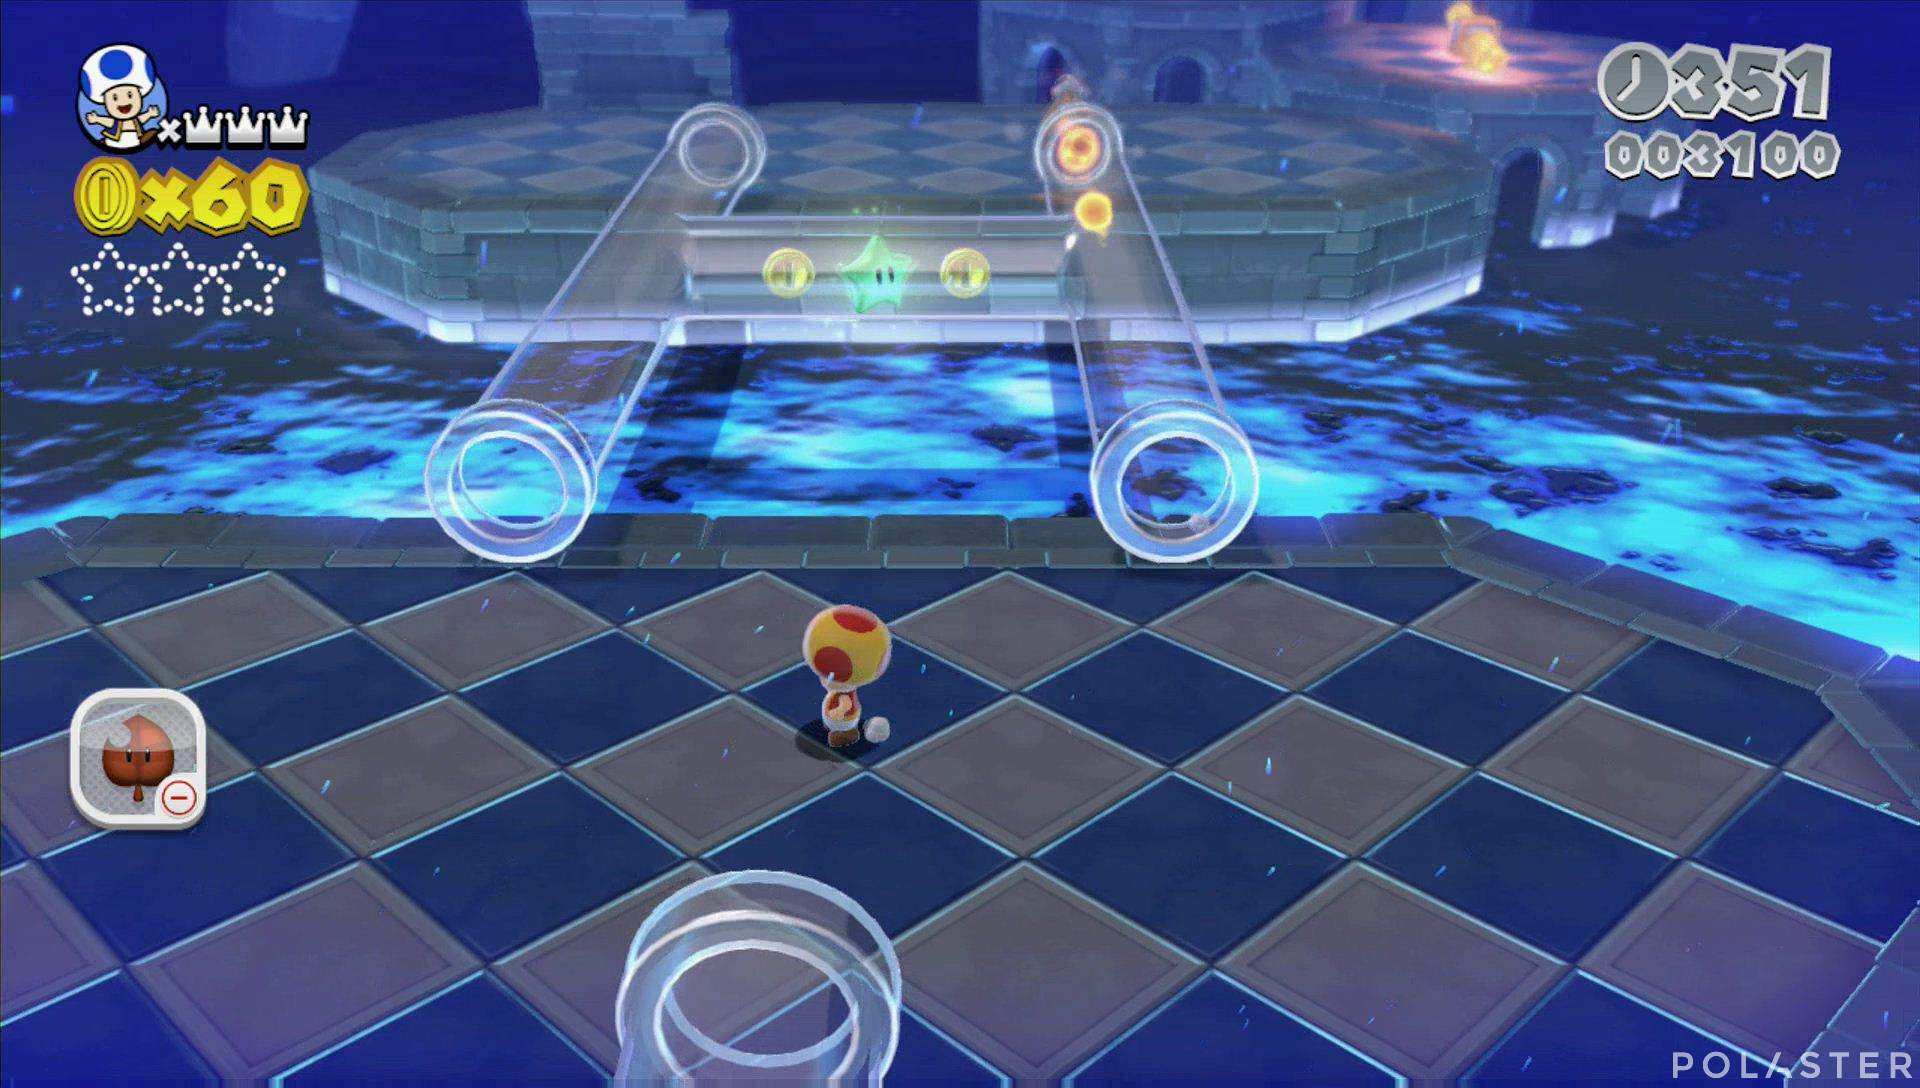 Super Mario 3D World Mundo Castillo-1 Estrella 1